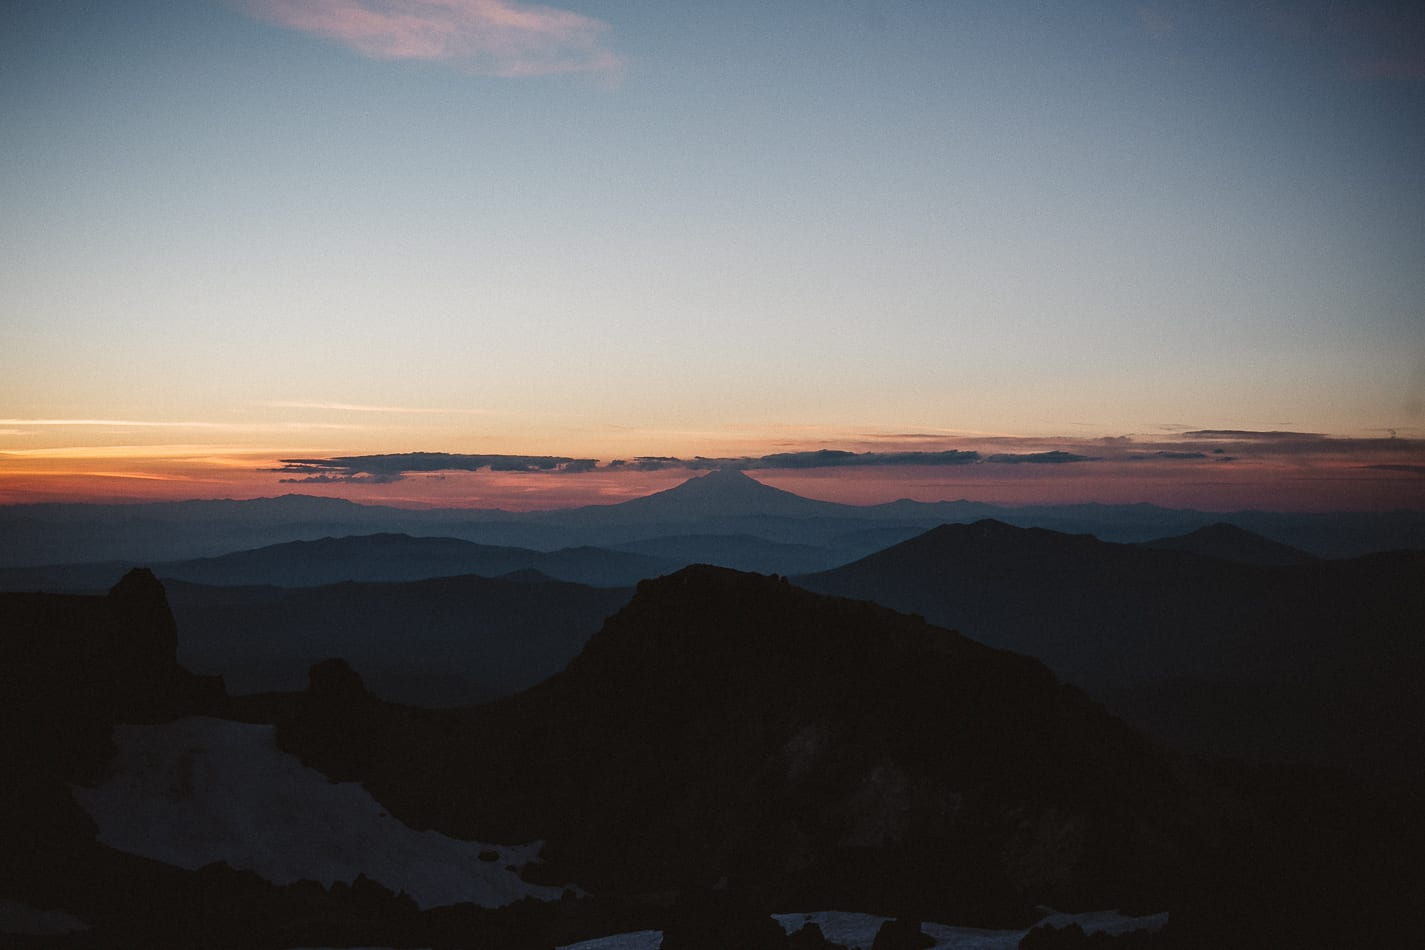 mount-lassen-california-adventure-lifestyle-photorapher-37